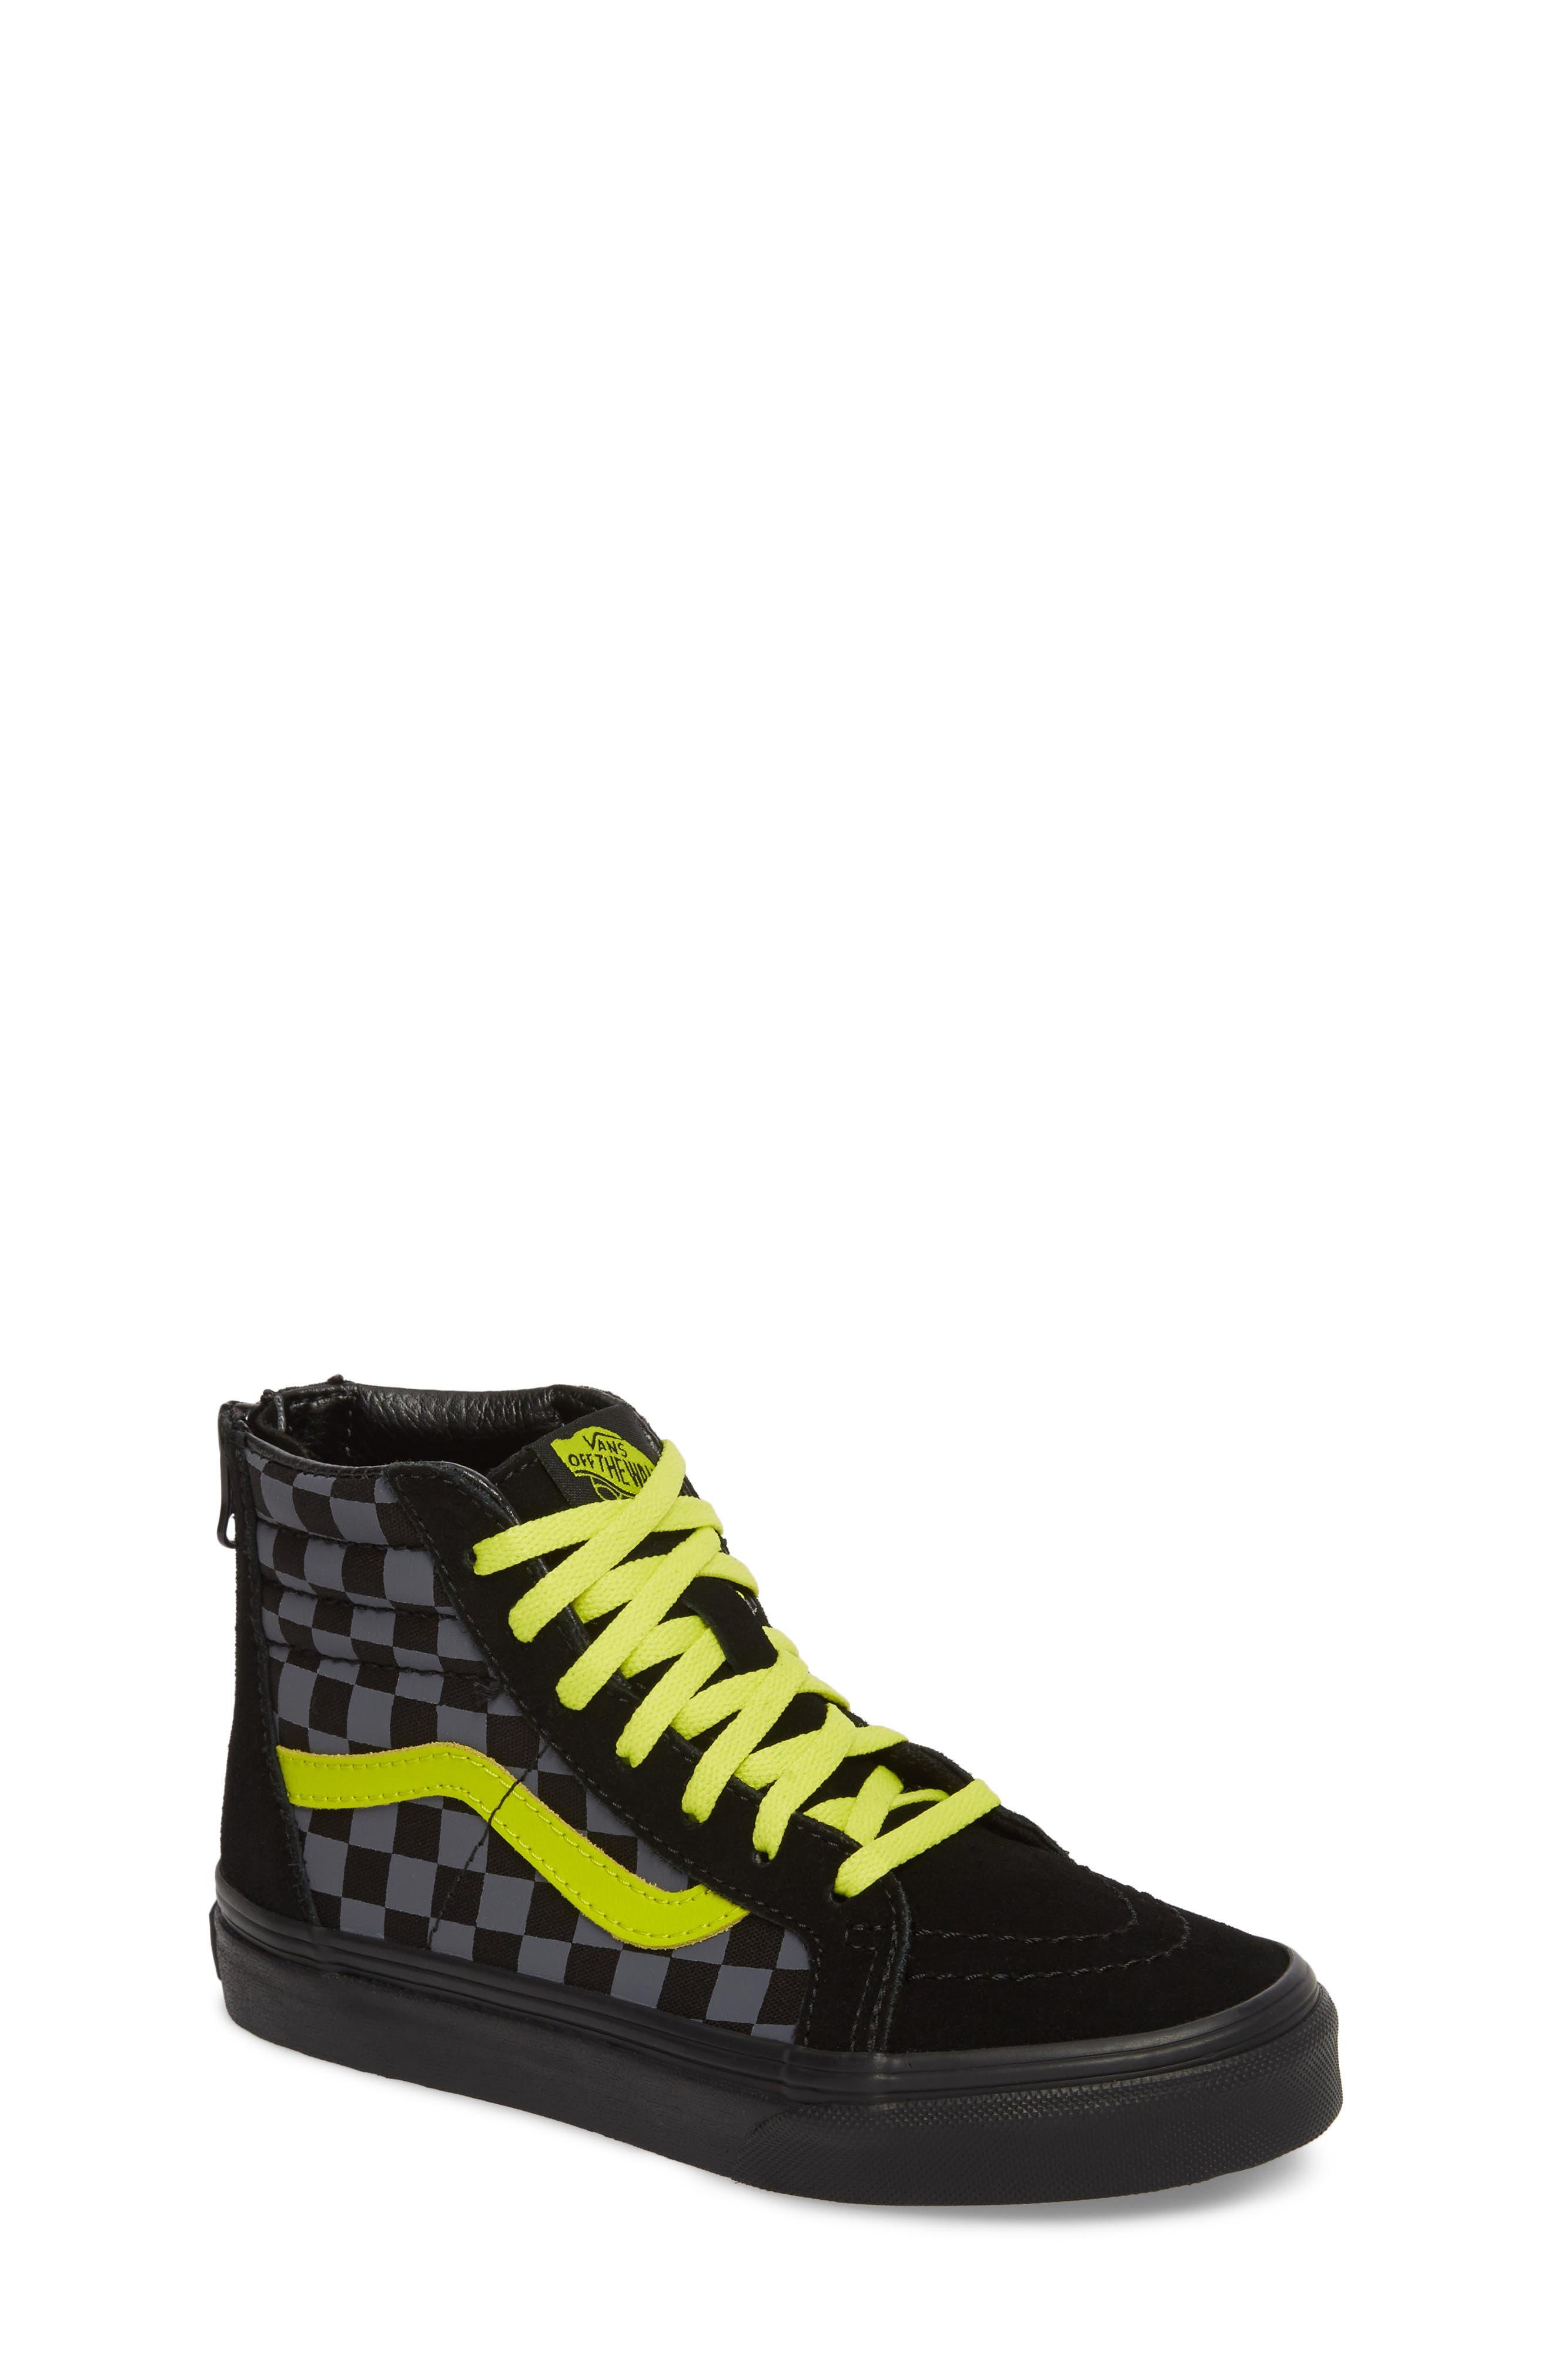 Reflective Checkerboard SK8-Hi Zip Sneaker,                             Main thumbnail 1, color,                             Asphalt/ Reflective